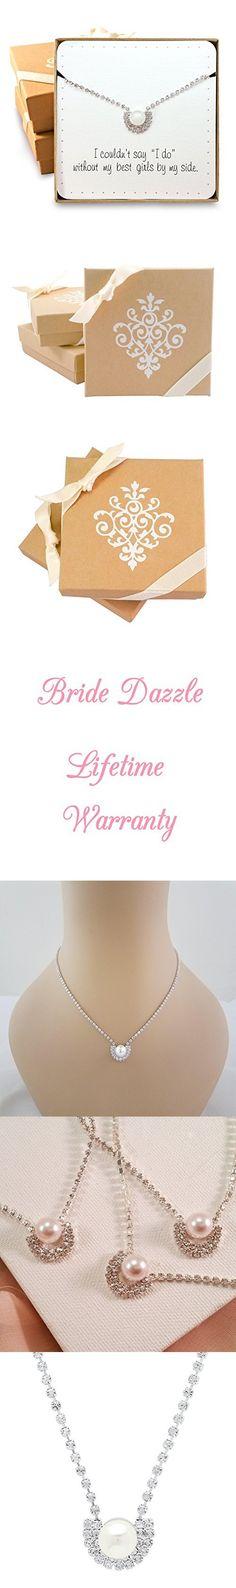 Bridesmaid Gifts - Elegant Single Pearl & Rhinestone Necklace, Set of 5